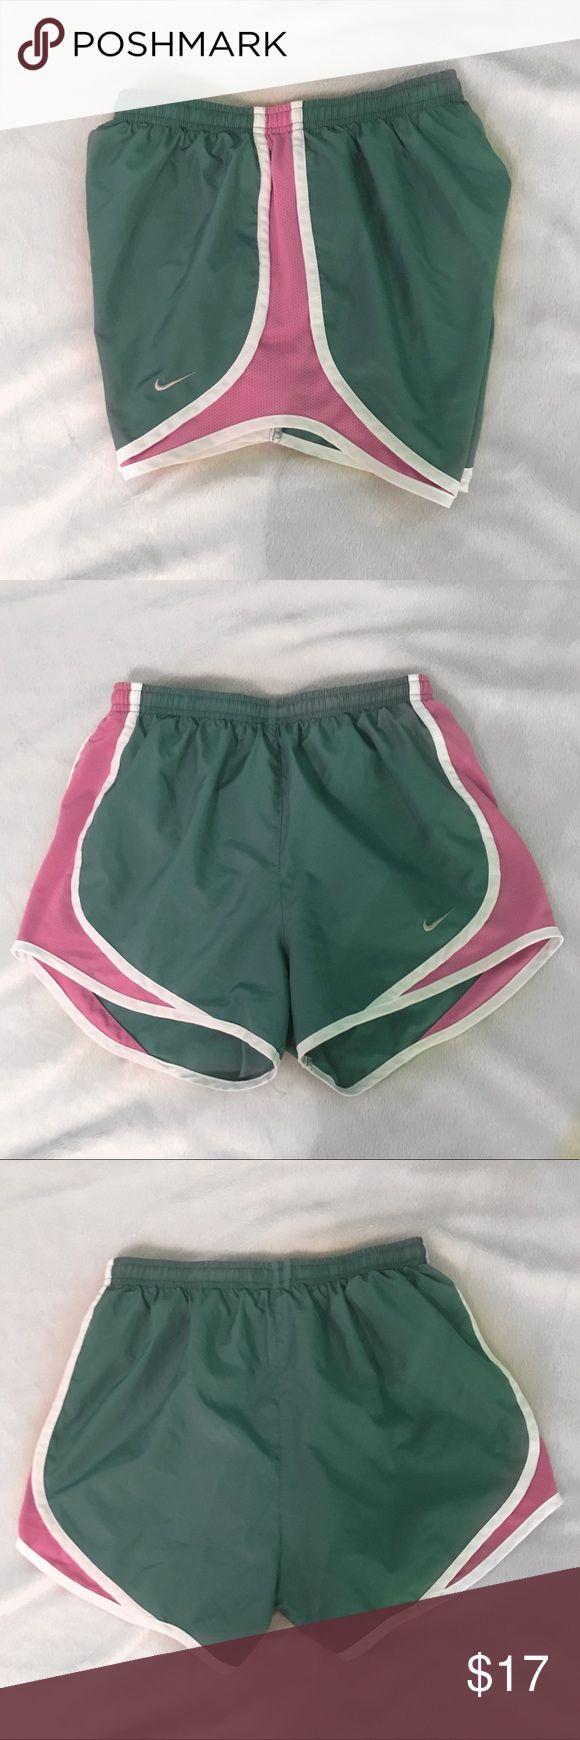 Green pink & white nike shorts Super cute Nike shorts in amazing condition! Nike Shorts